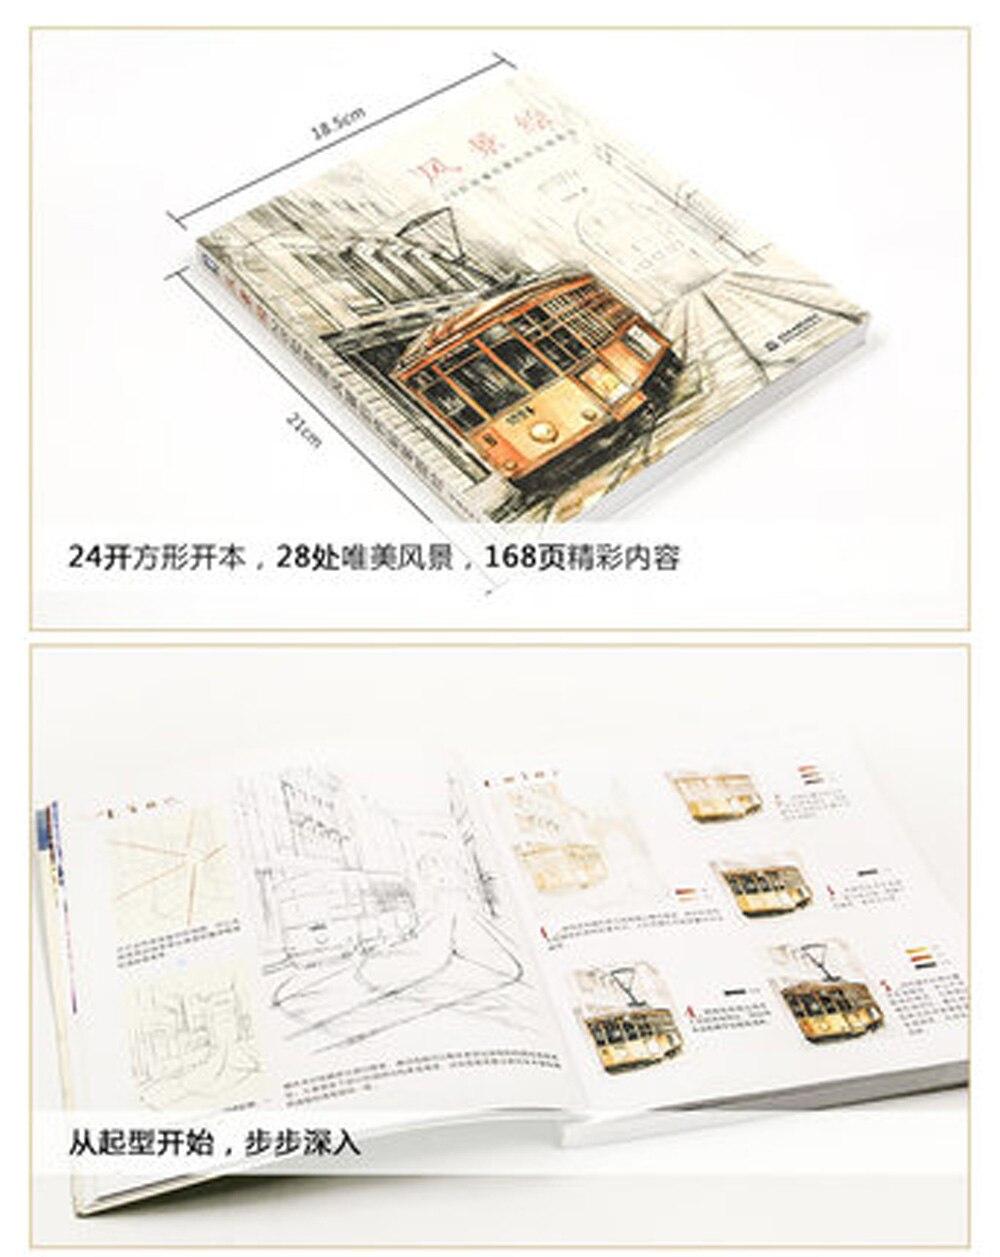 Livro de Desenho 94 Infantis Olhar Jardim Secreto